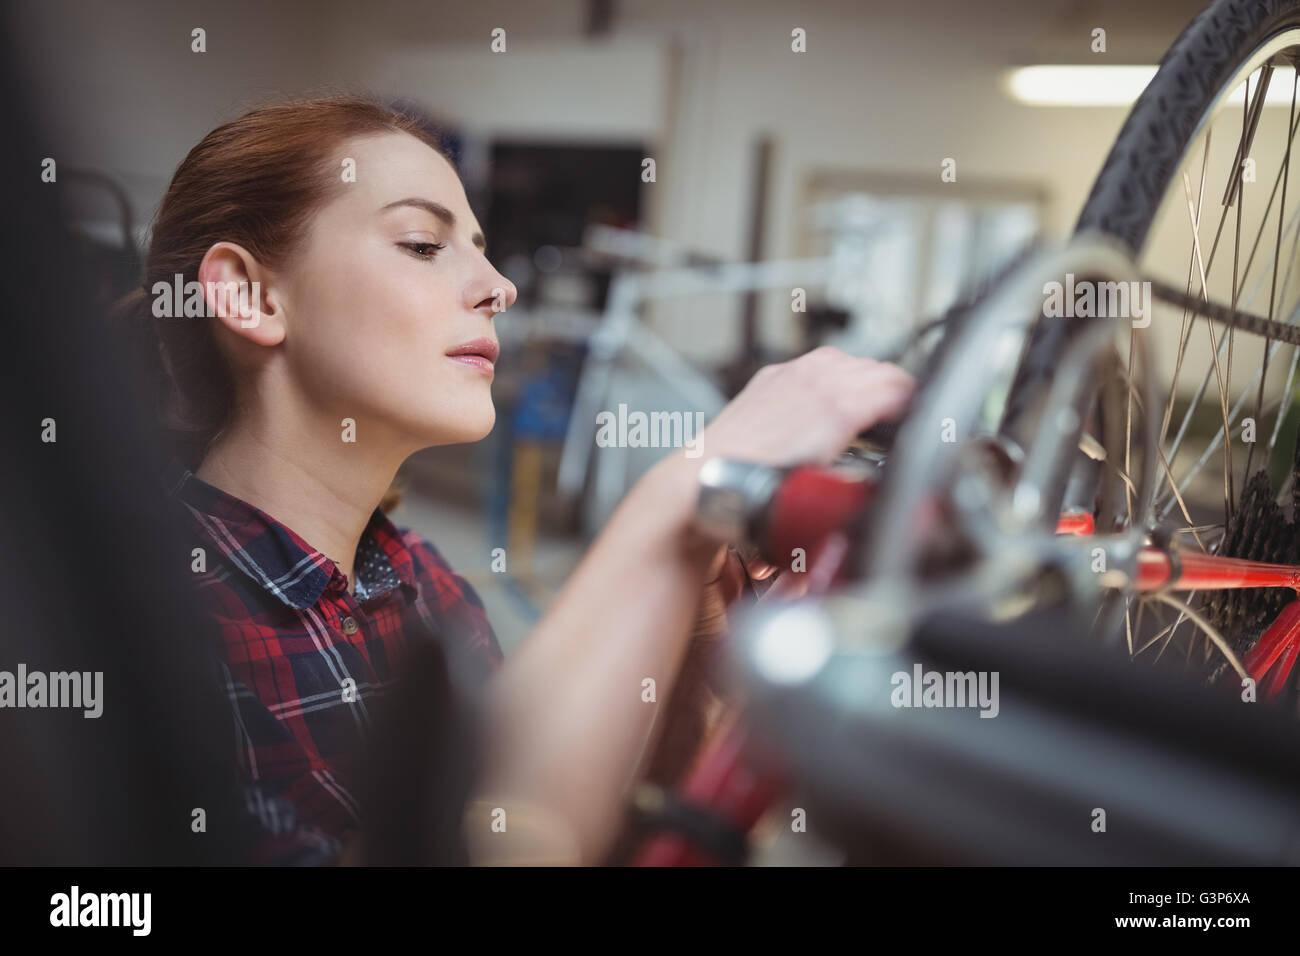 Female mechanic repairing a bicycle - Stock Image